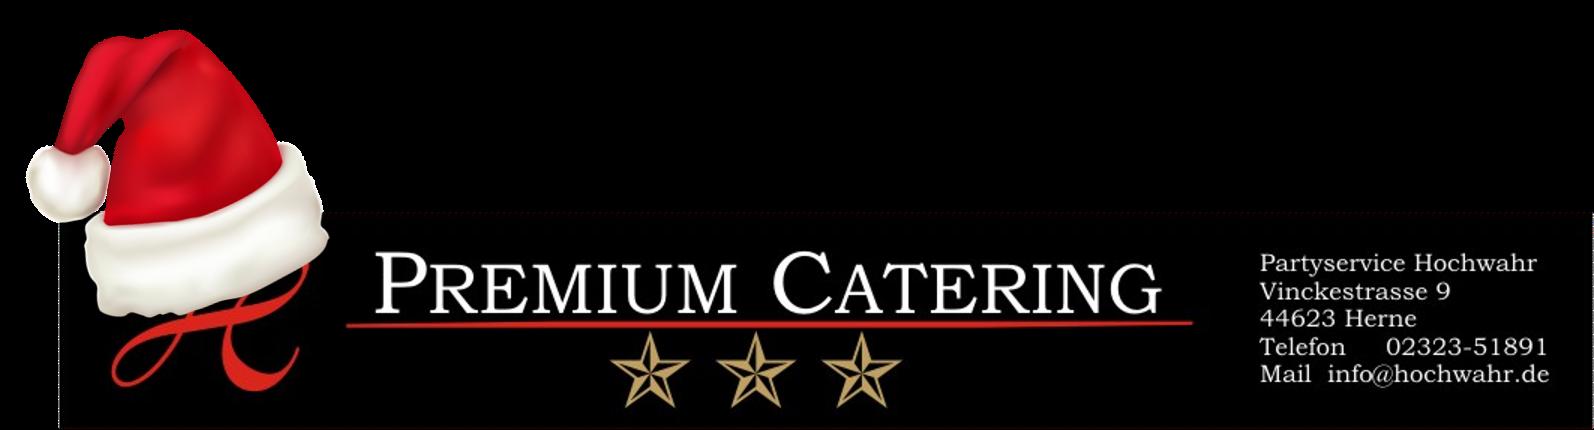 Hochwahr Premium Catering